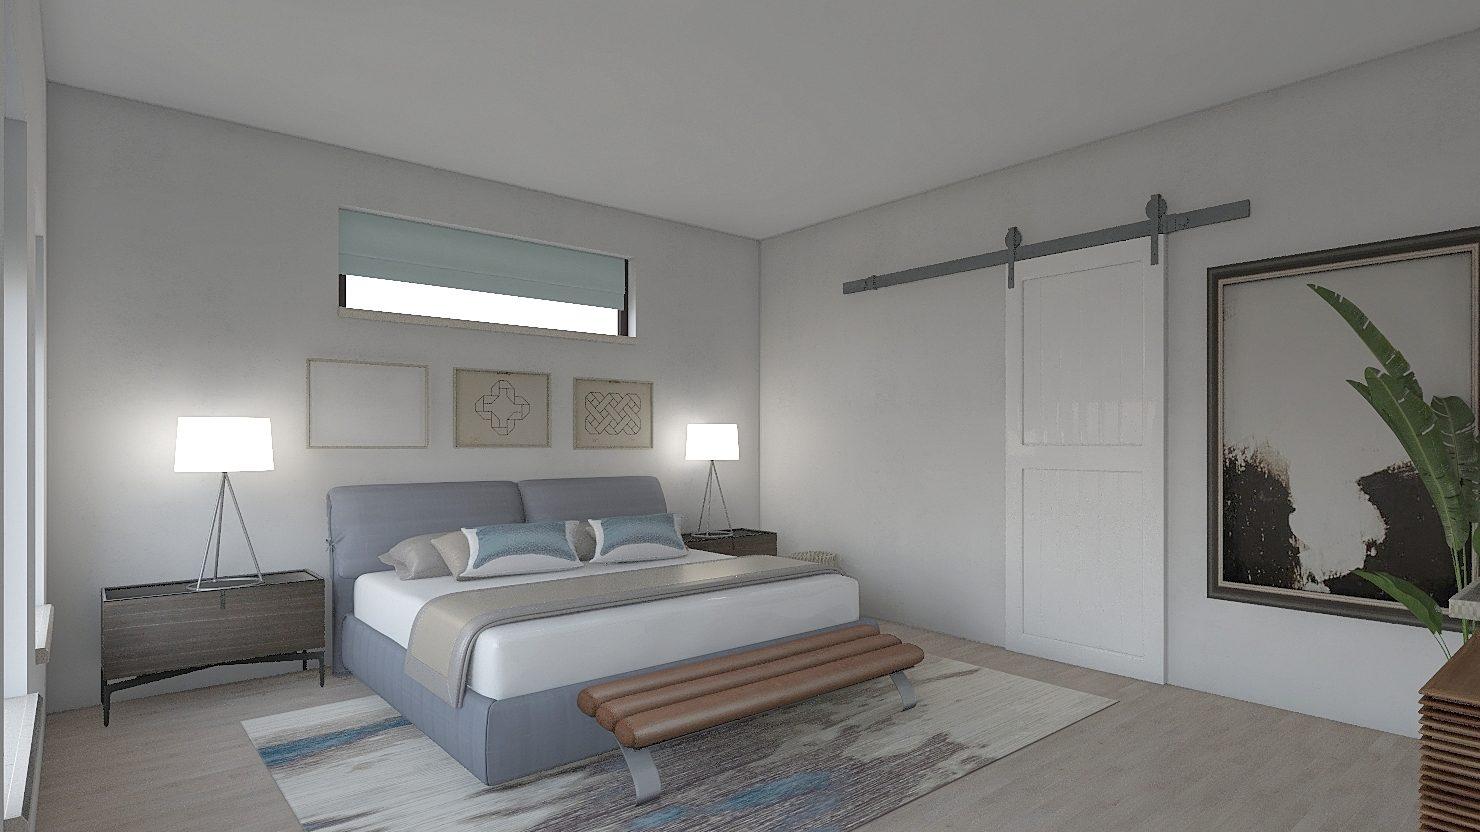 Corbell bedroom 2